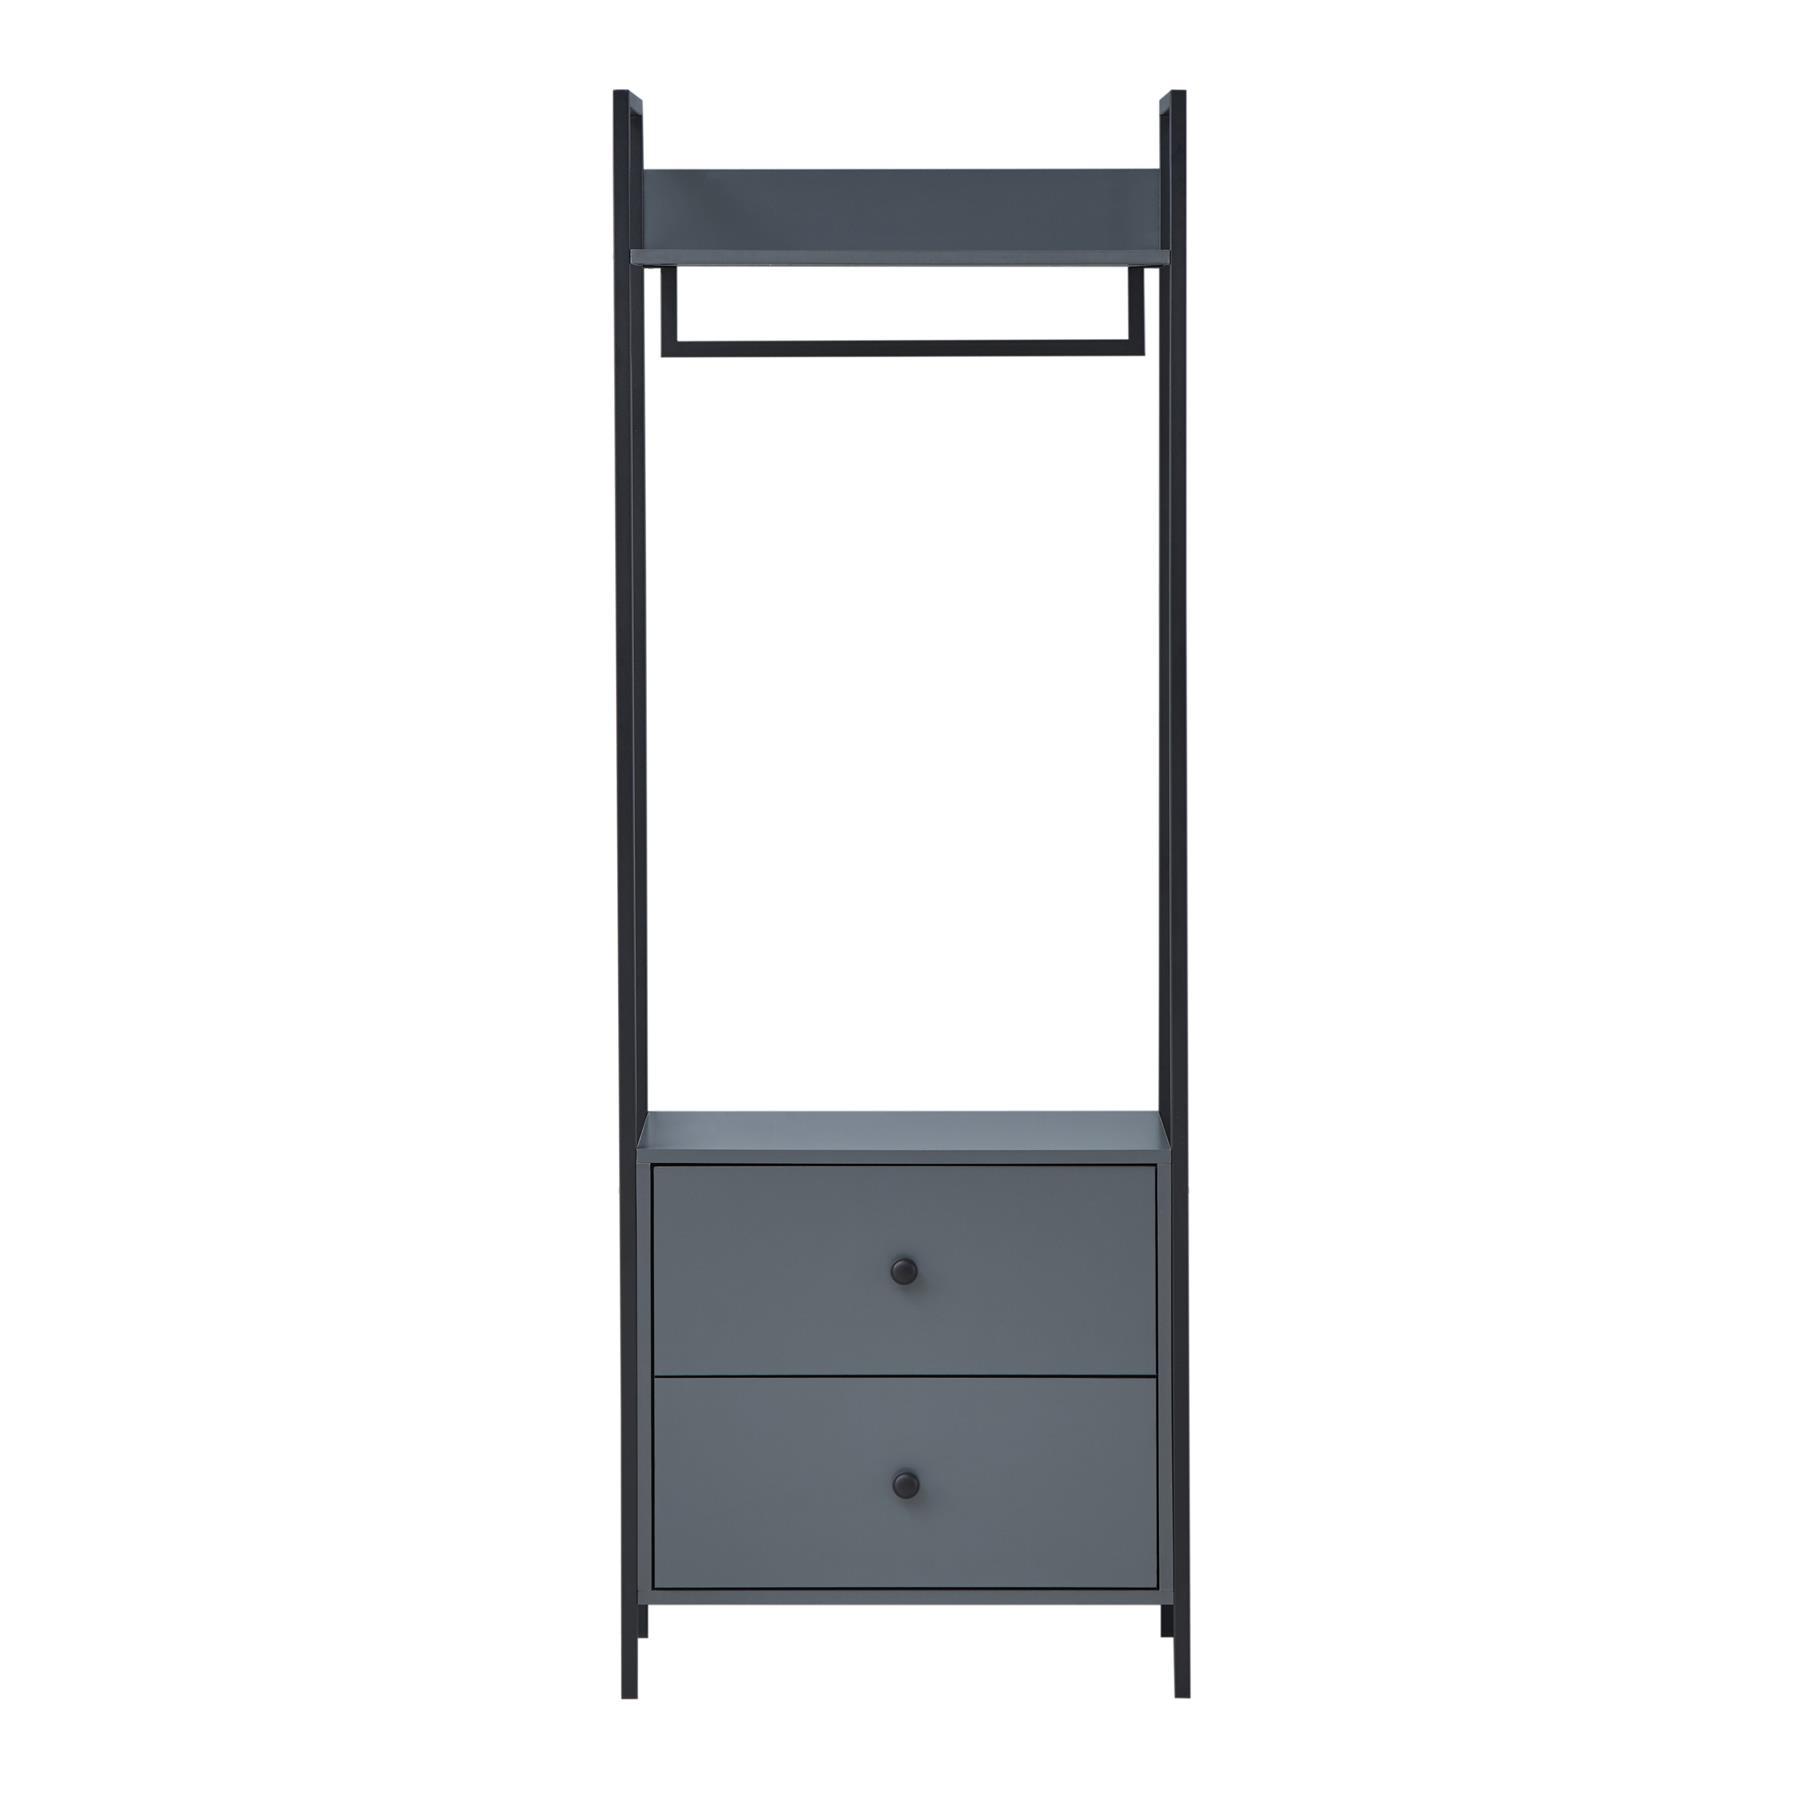 Zahra Bedroom Furniture Open Wardrobe Drawers Cabinet Modern Storage